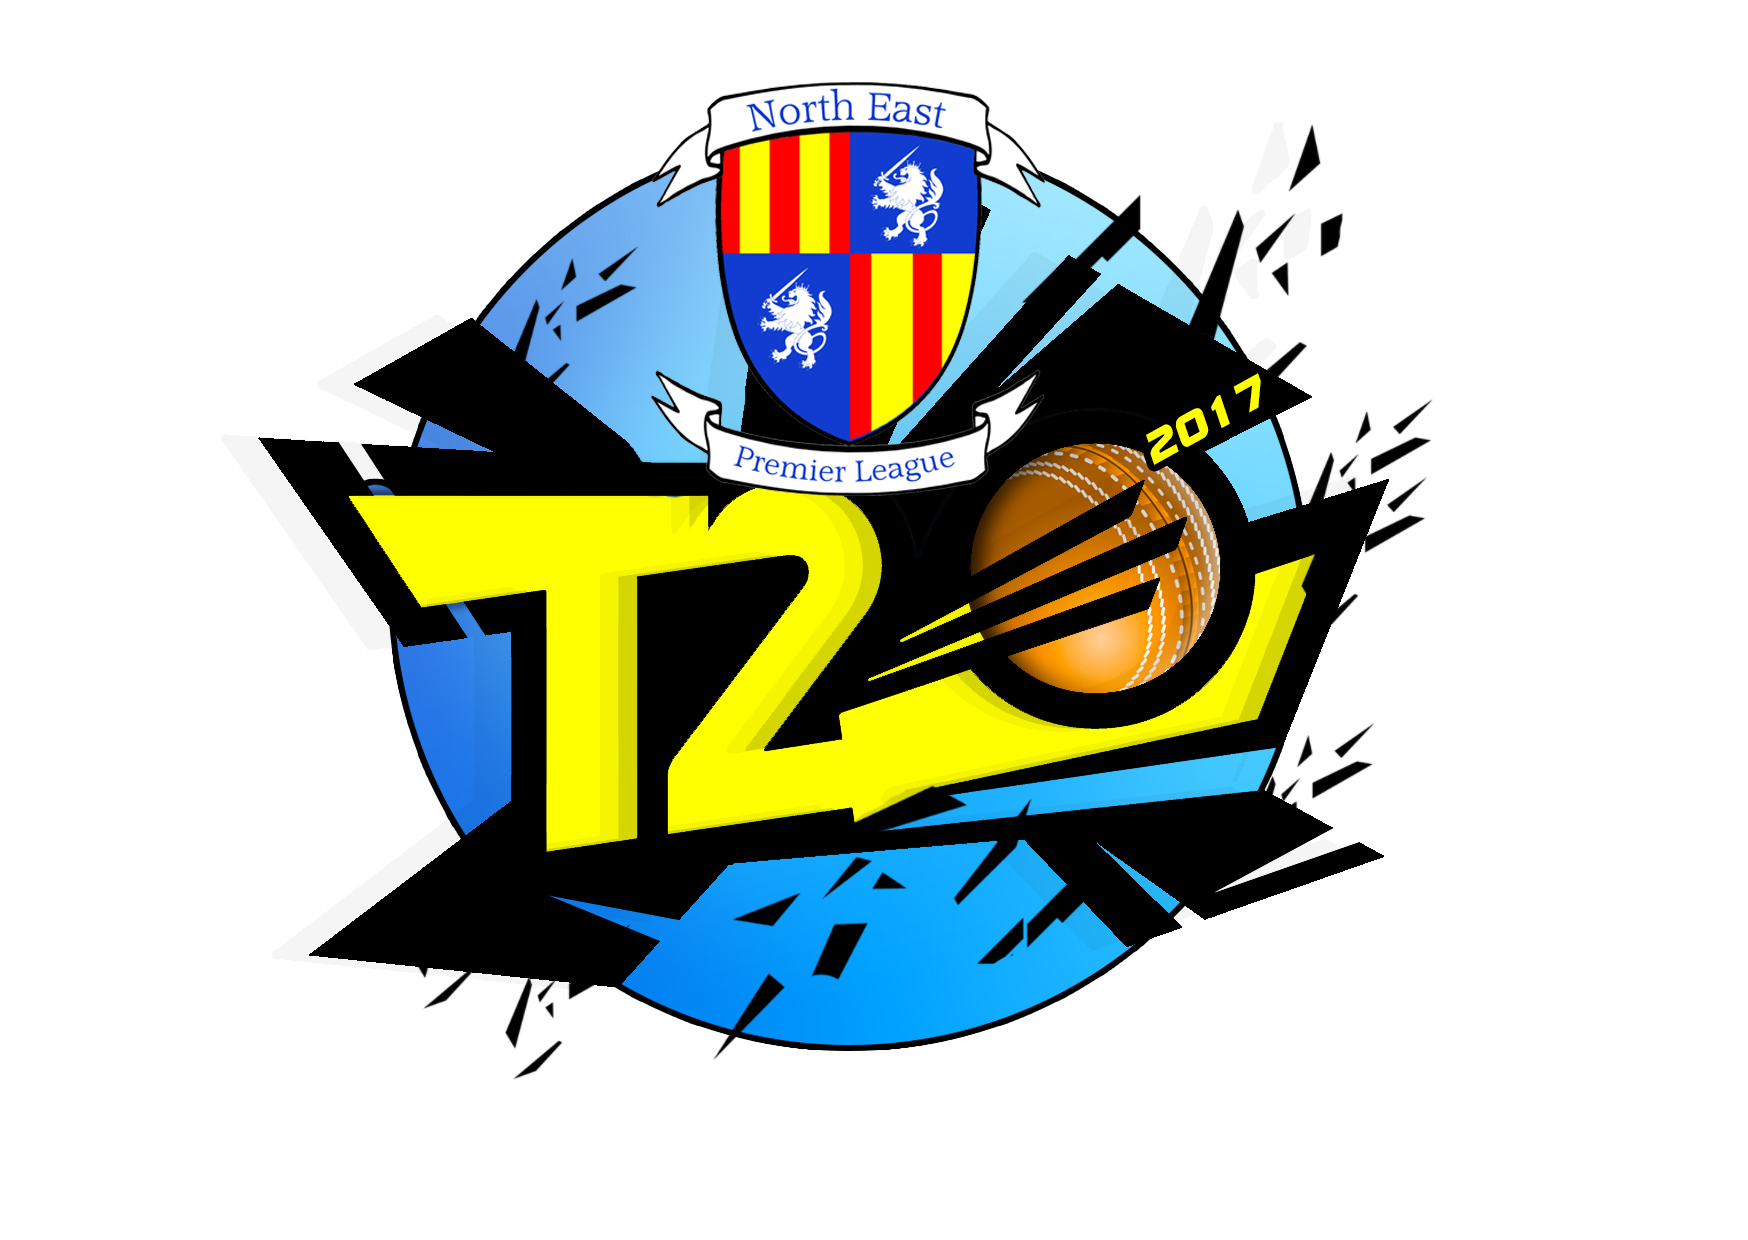 NEPL T20 LOGO 2017